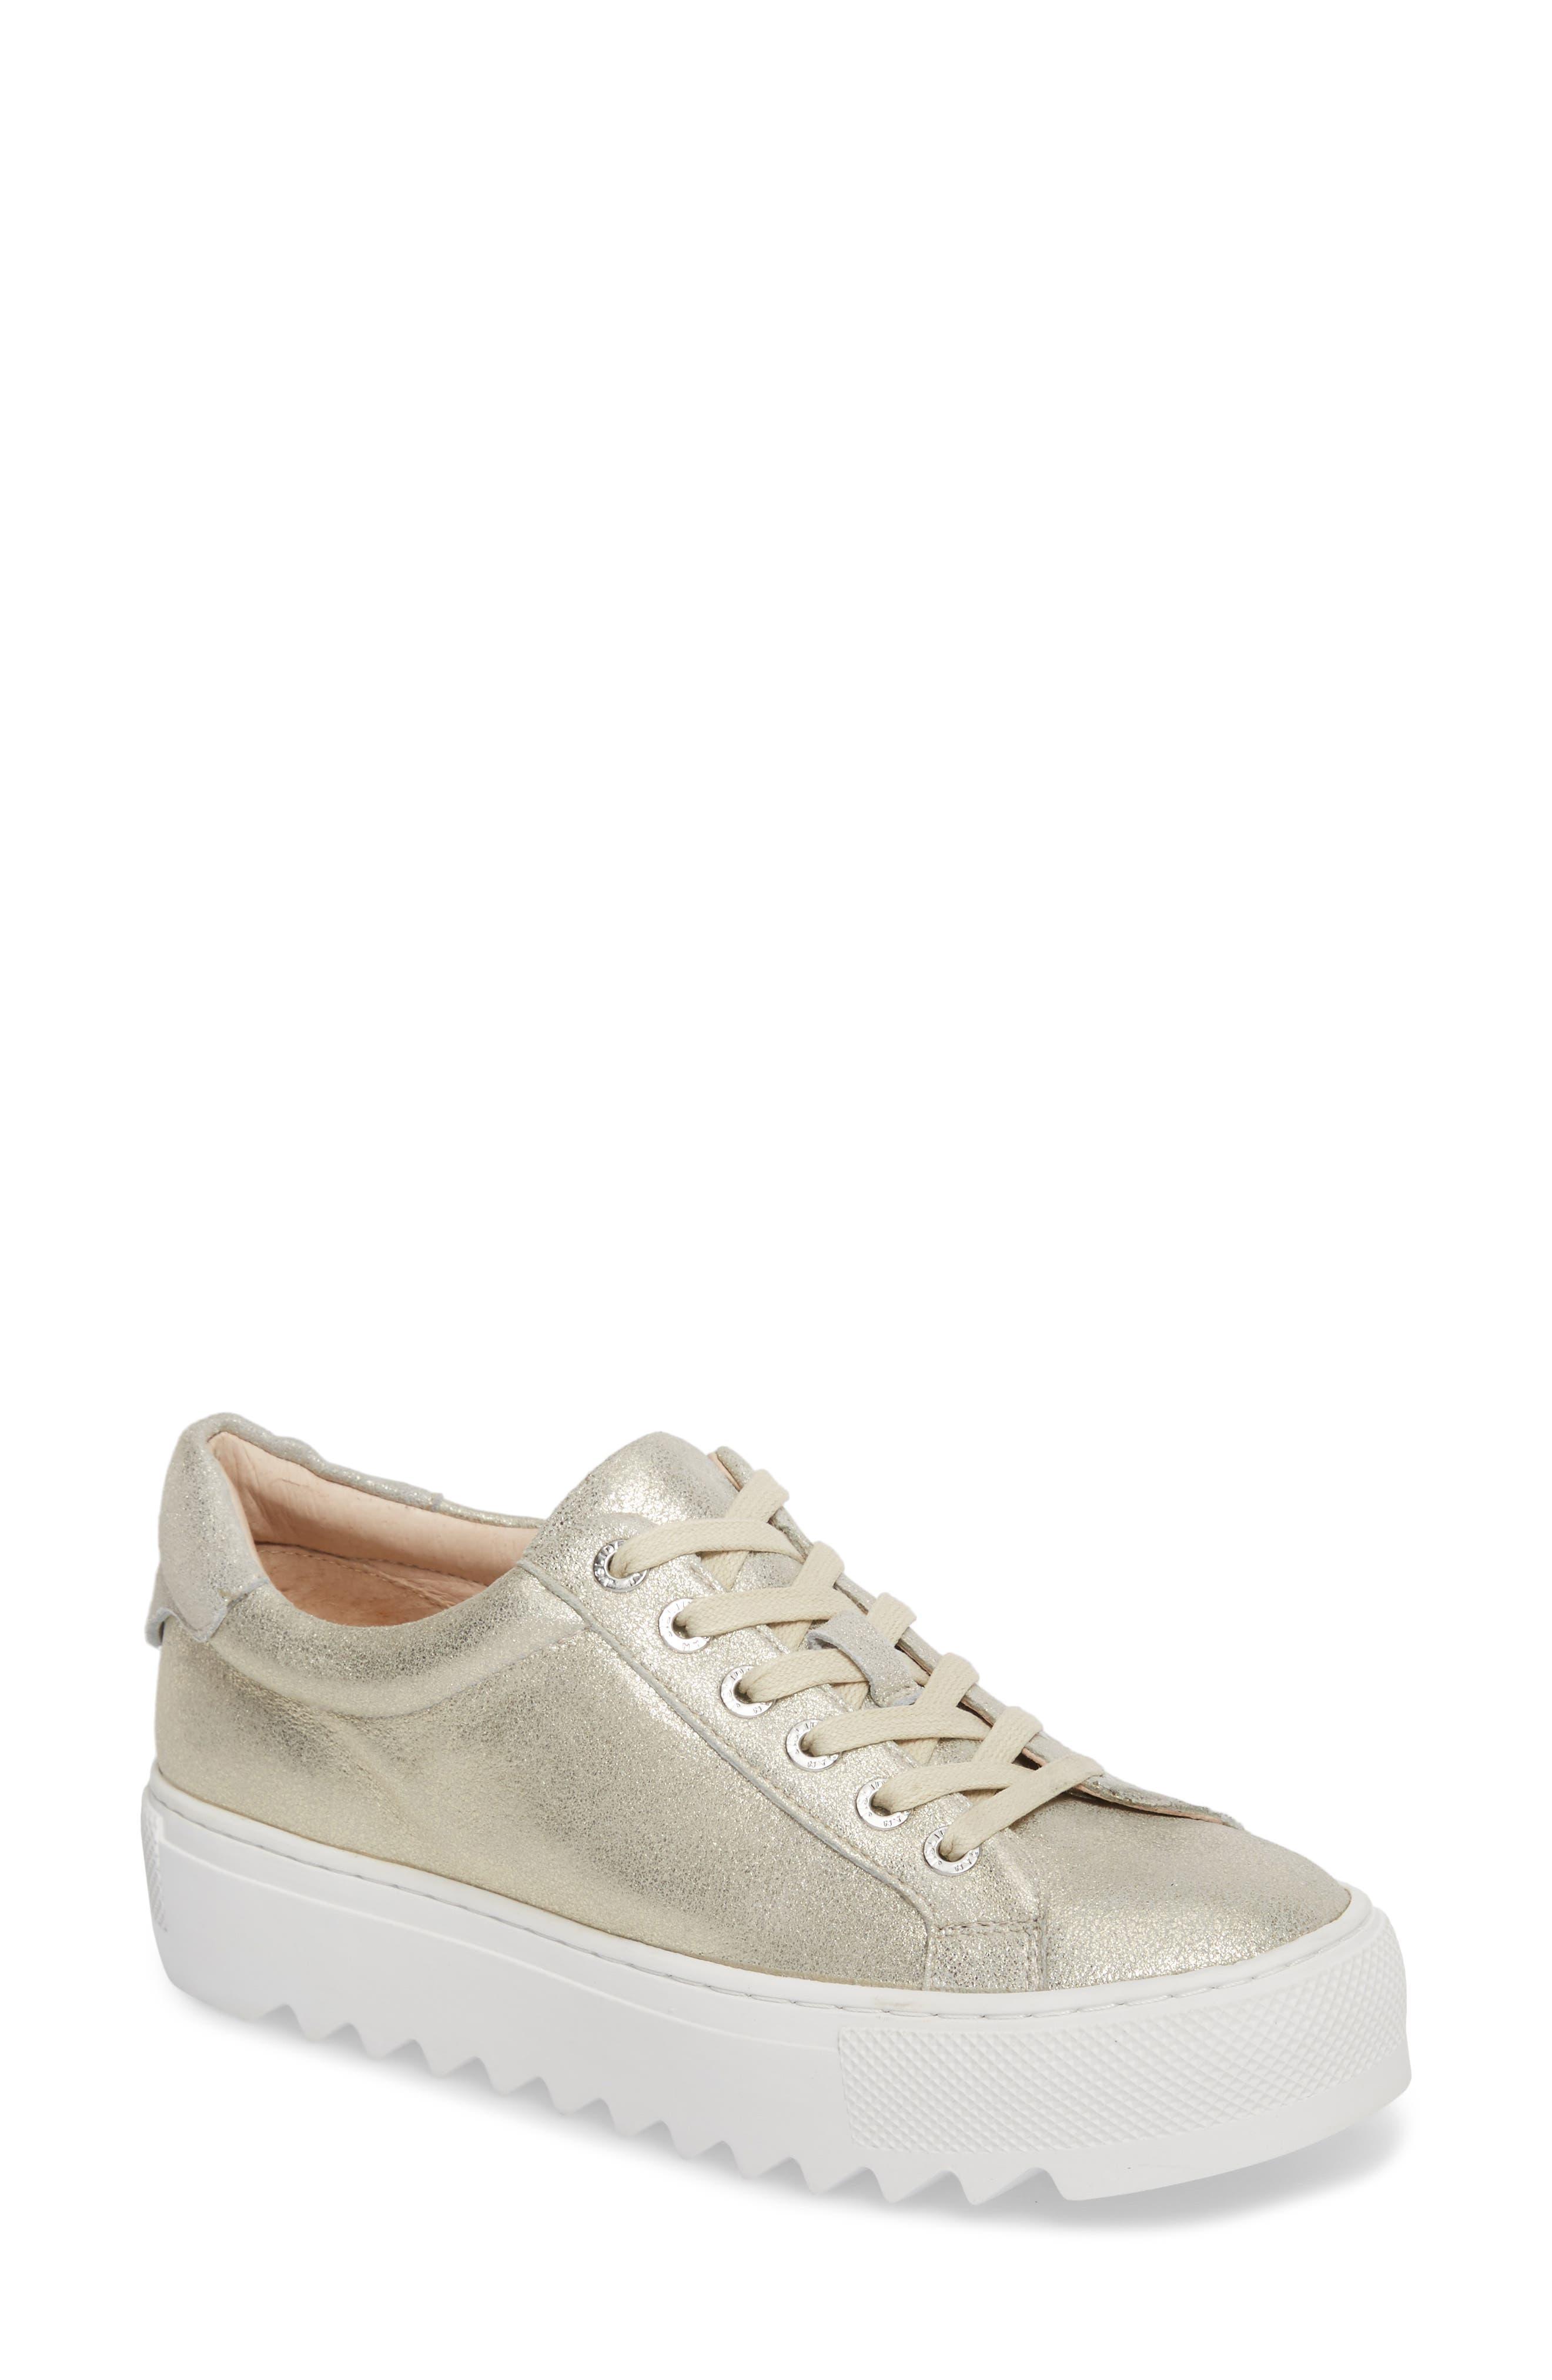 Sapphire Platform Sneaker,                         Main,                         color, Platino Leather